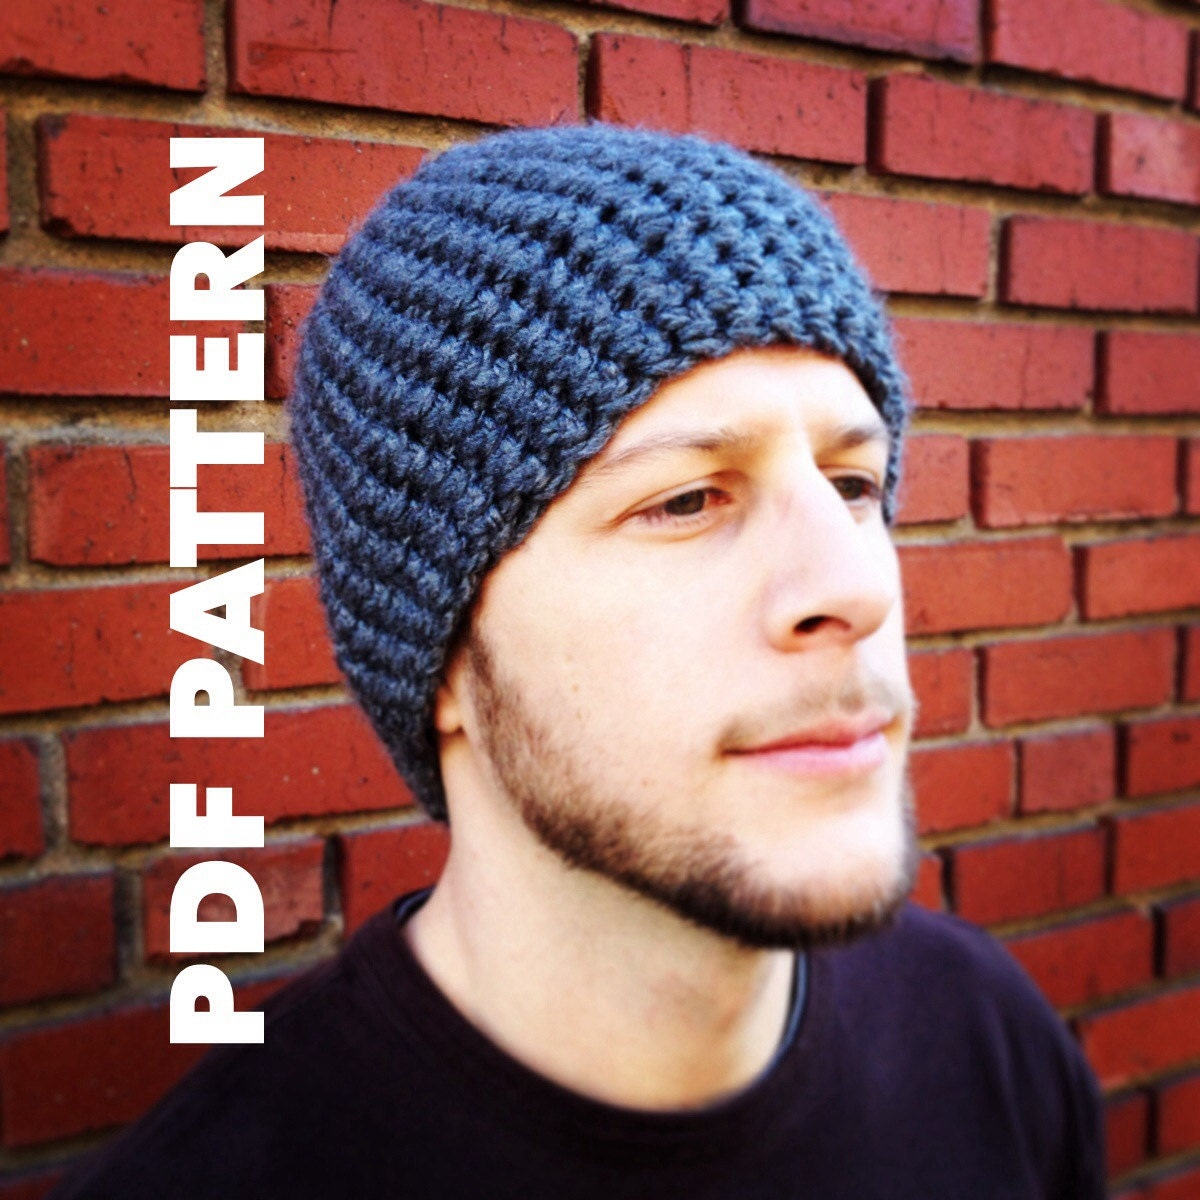 Fine Easy Mens Crochet Hat Pattern Gift - Blanket Knitting Pattern ...